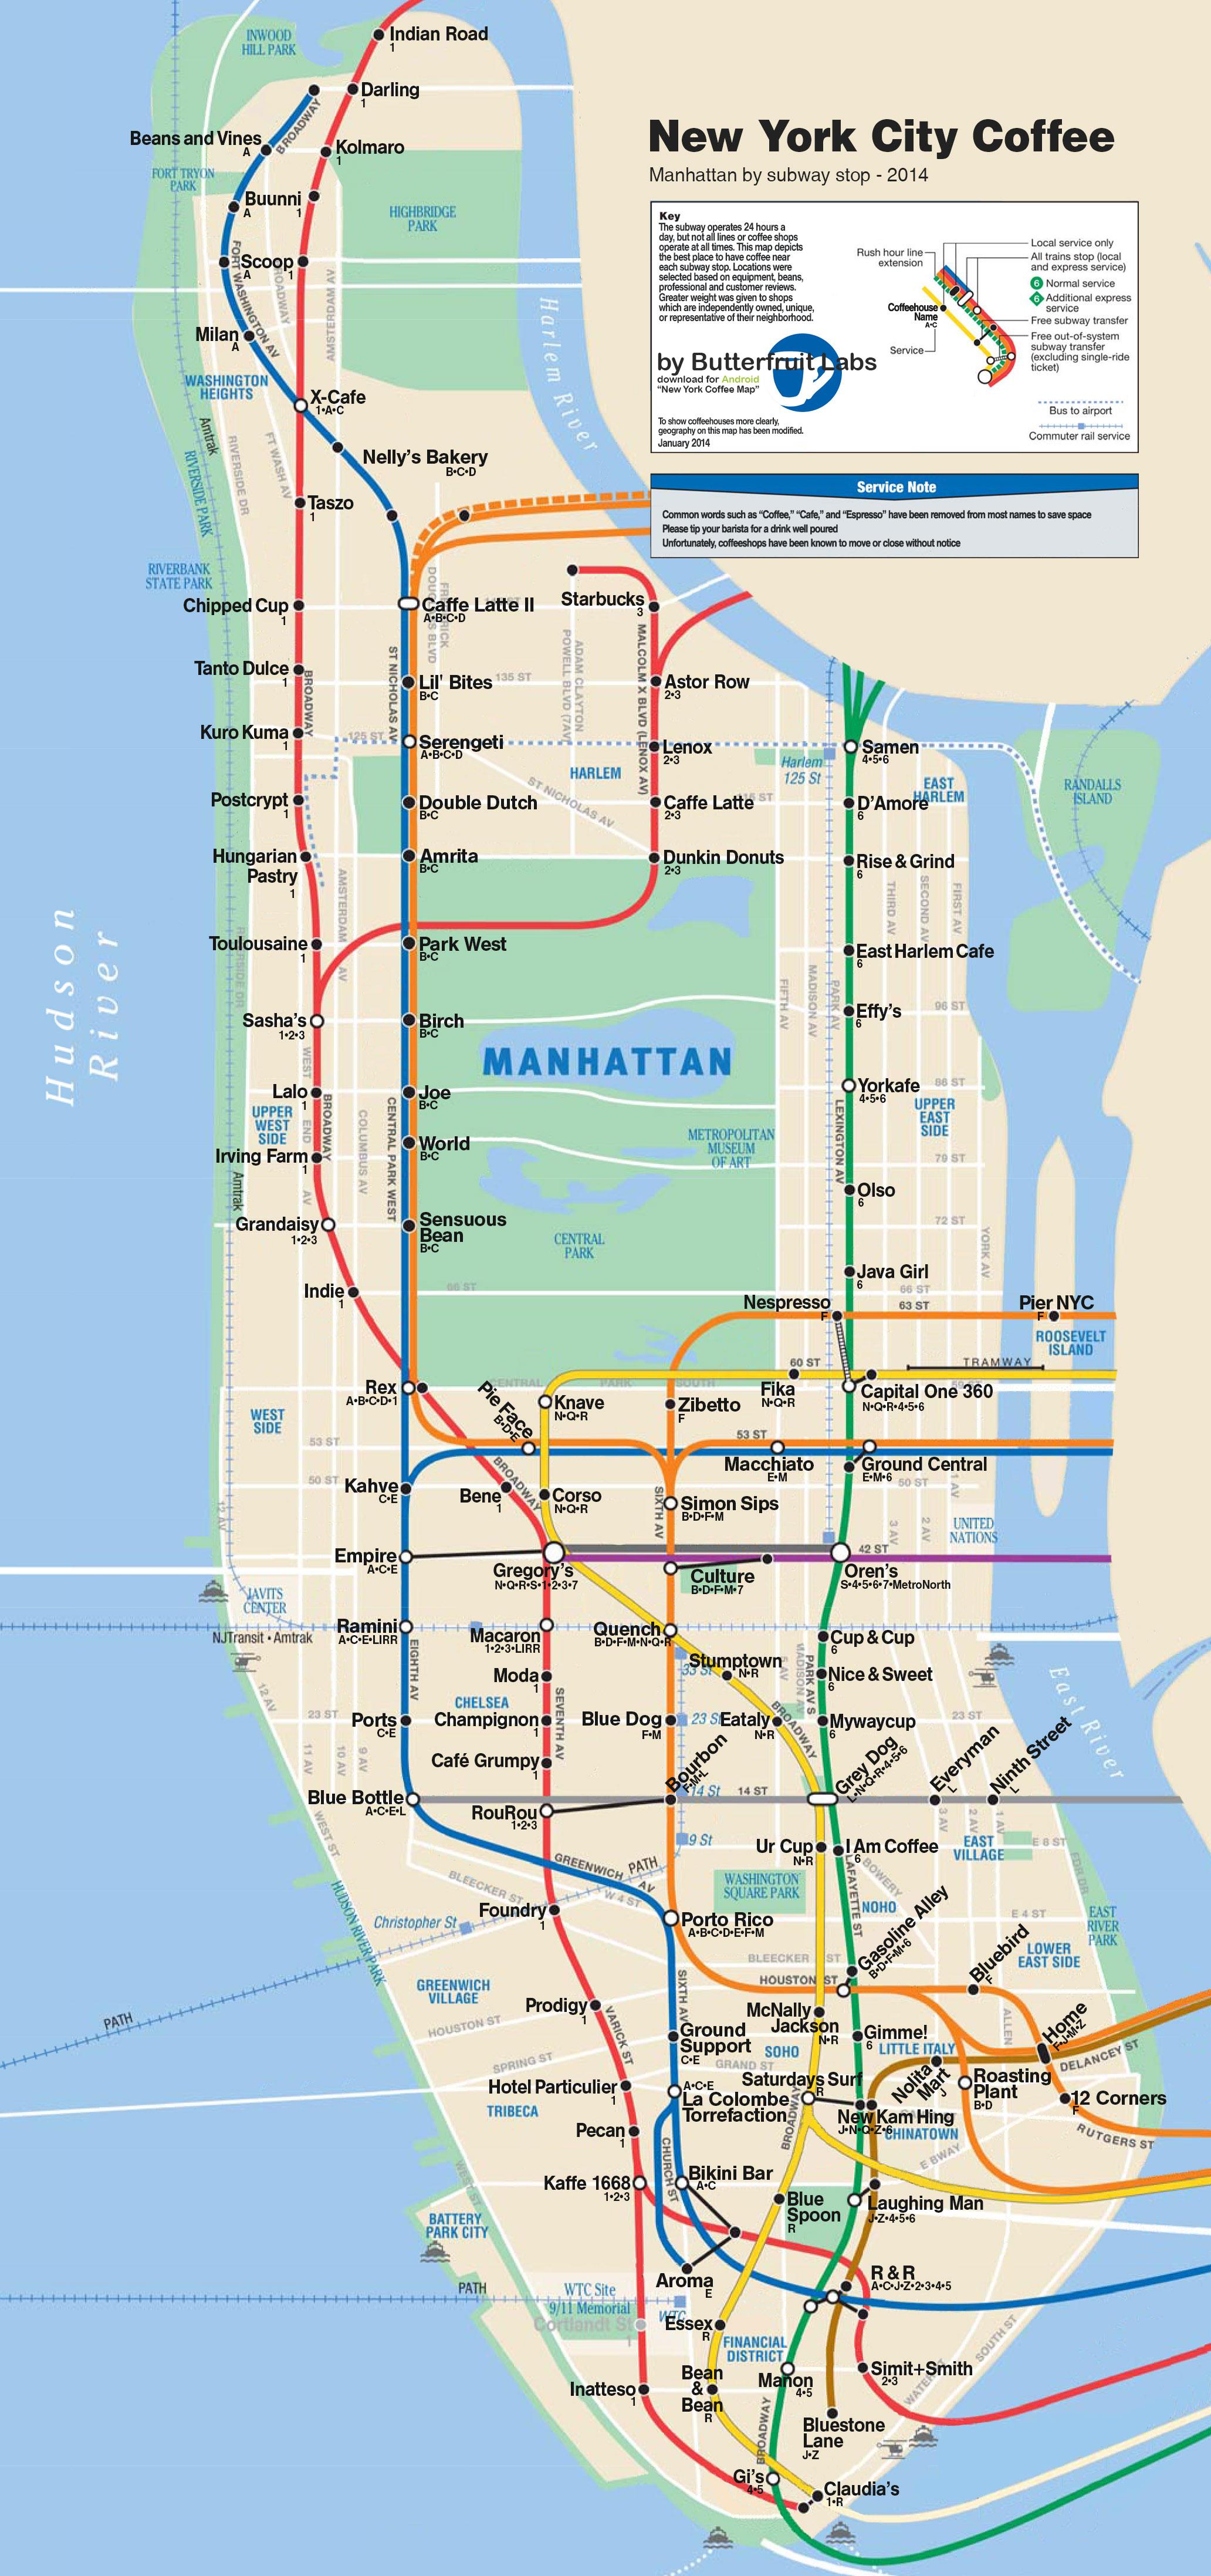 new york city subway diagram 2005 chevy express rear brakes no fluid events social network